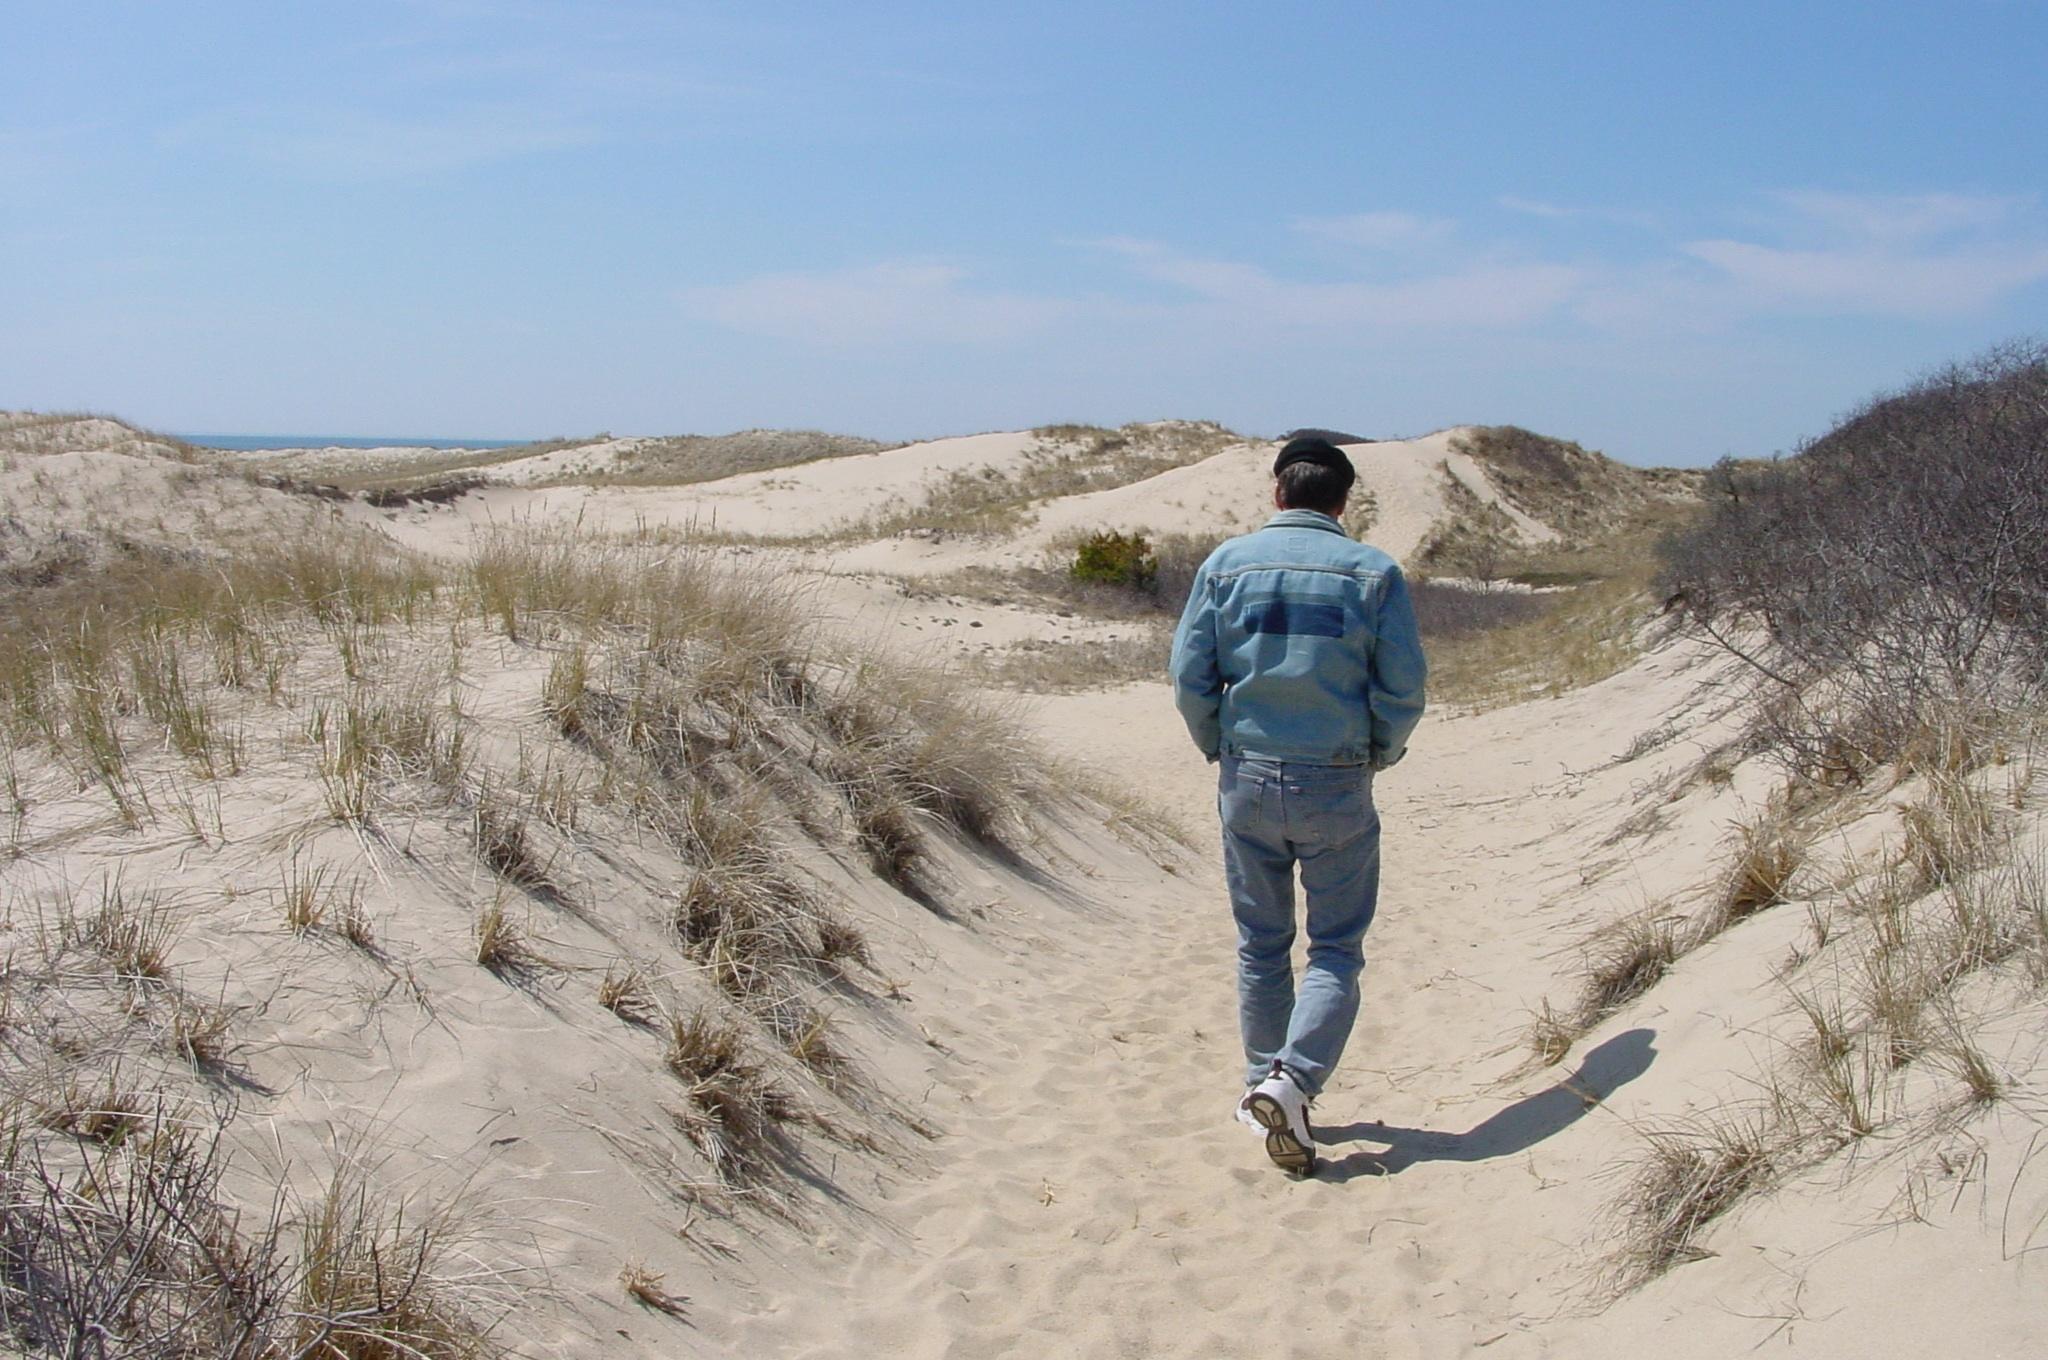 Walking the dunes in Provincetown, around 2009